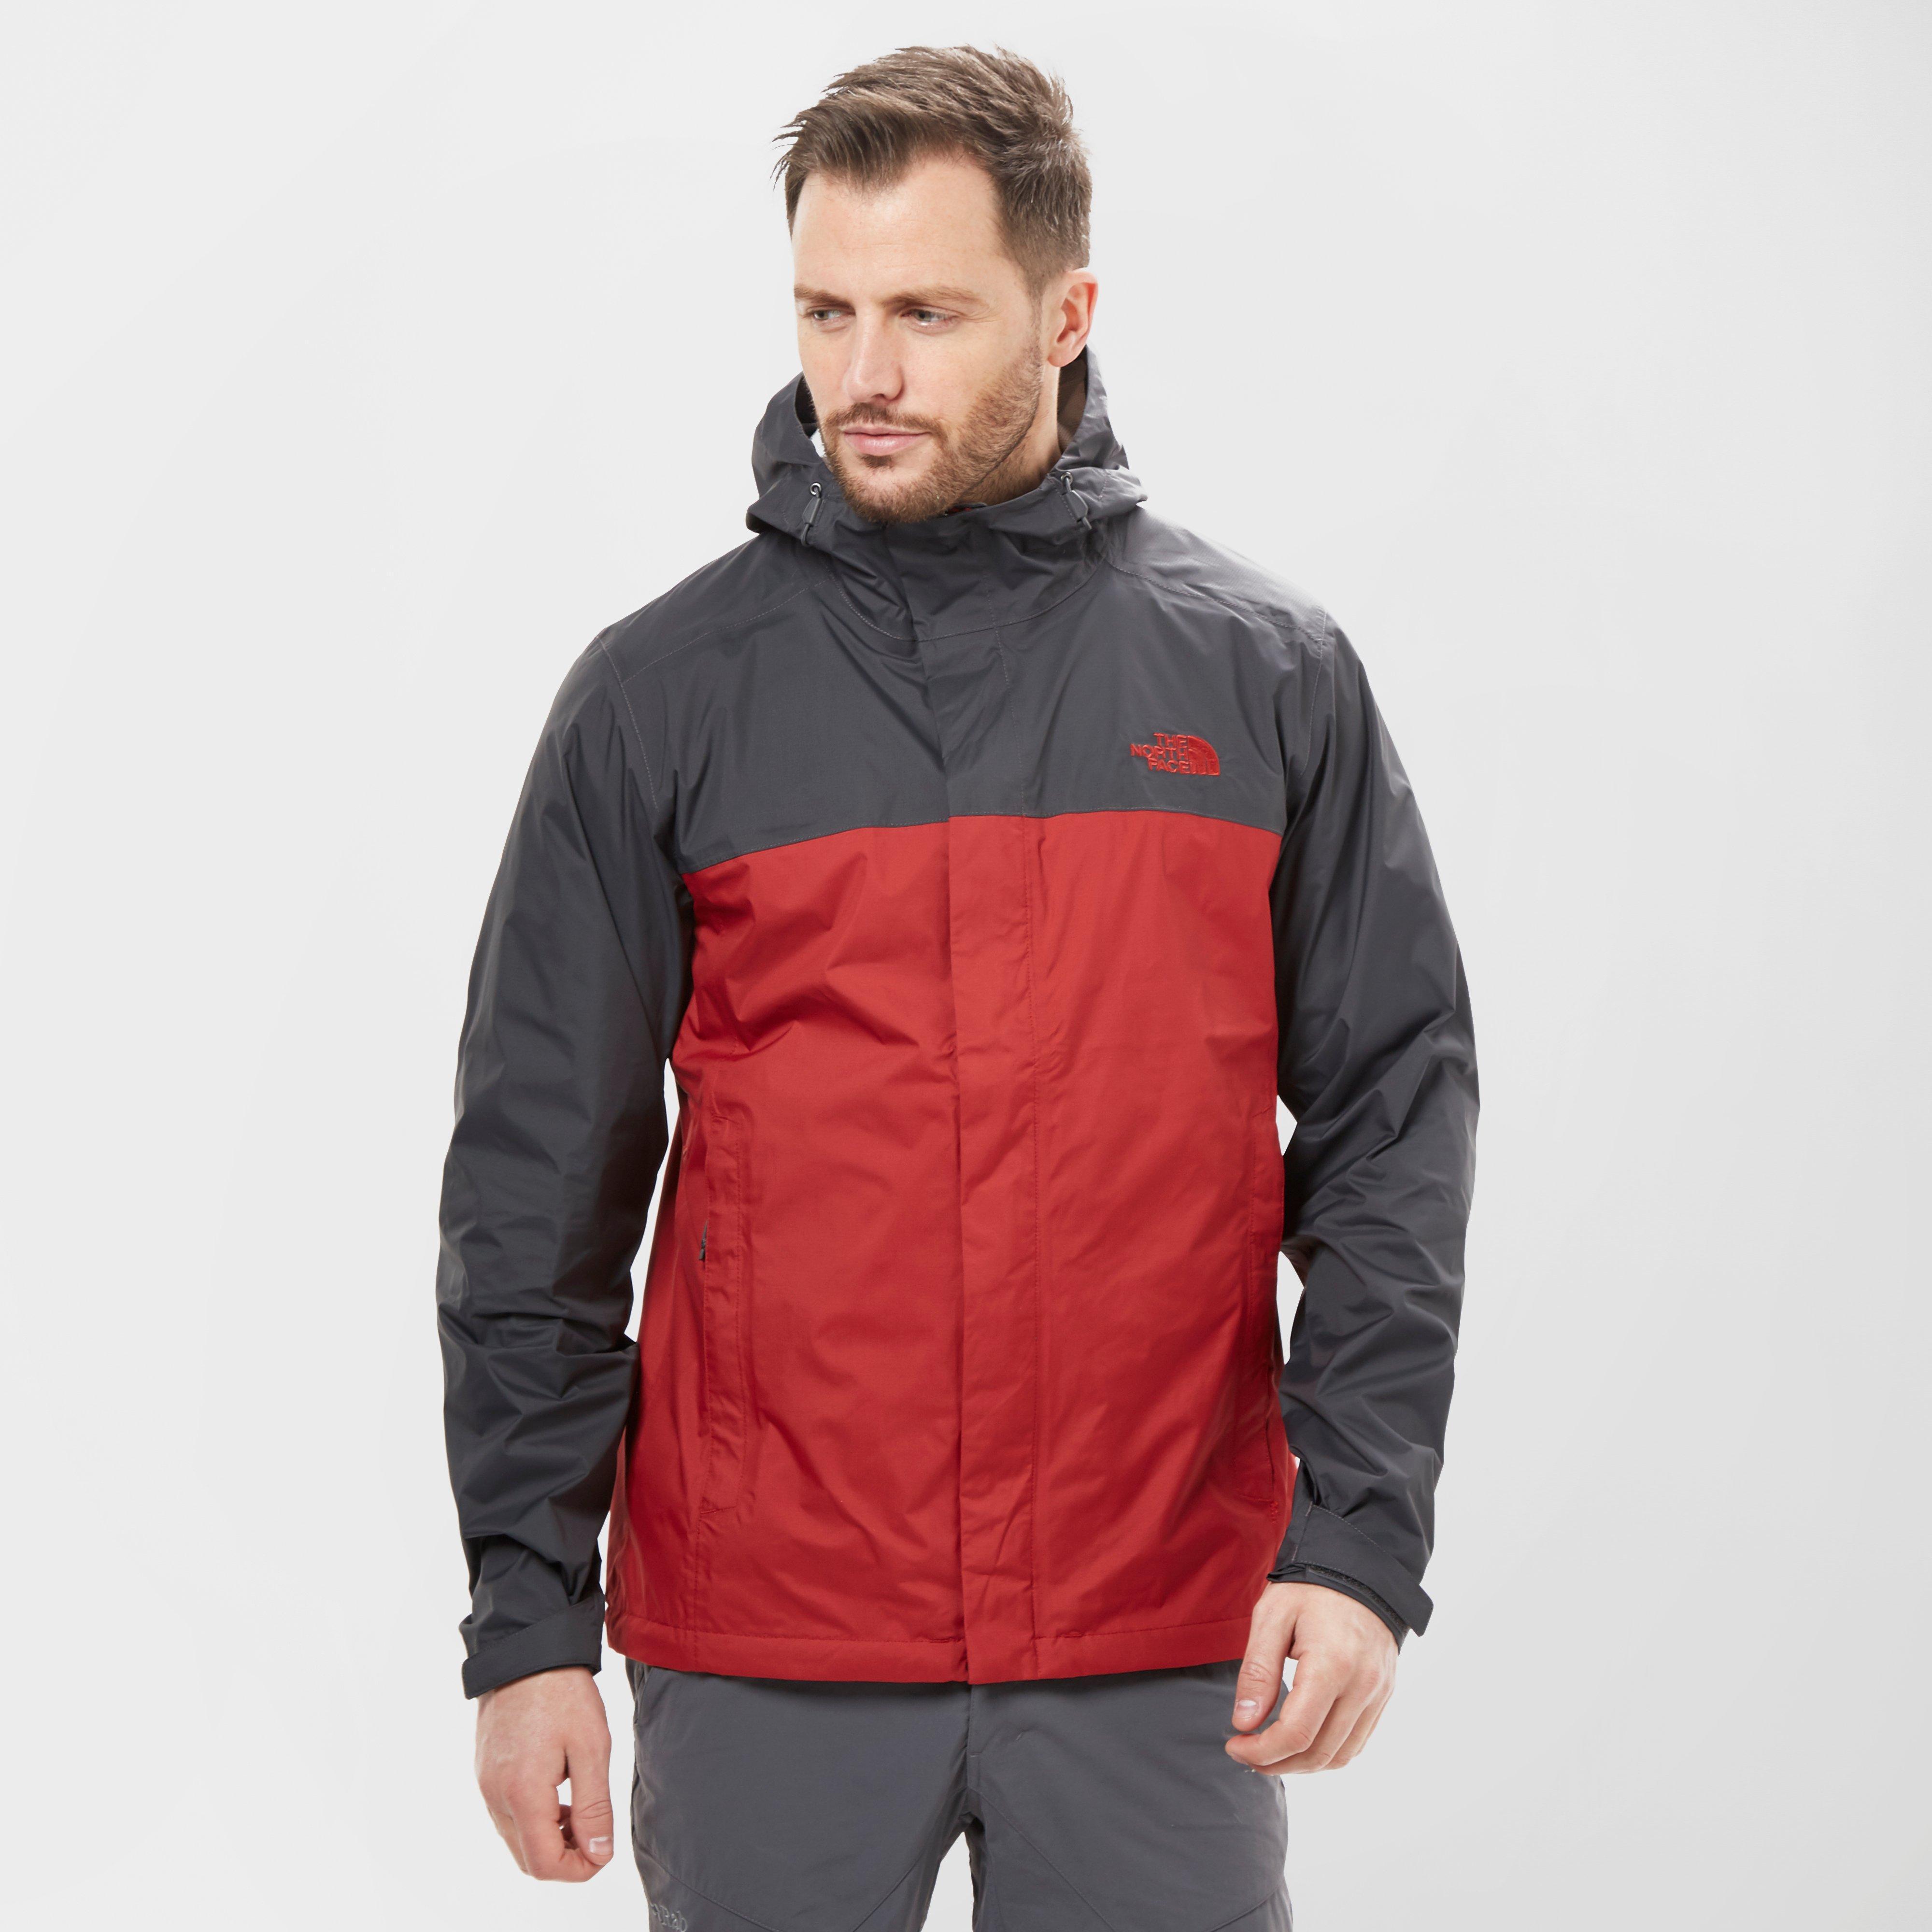 3e317a17e Men's Venture 2 Waterproof Jacket